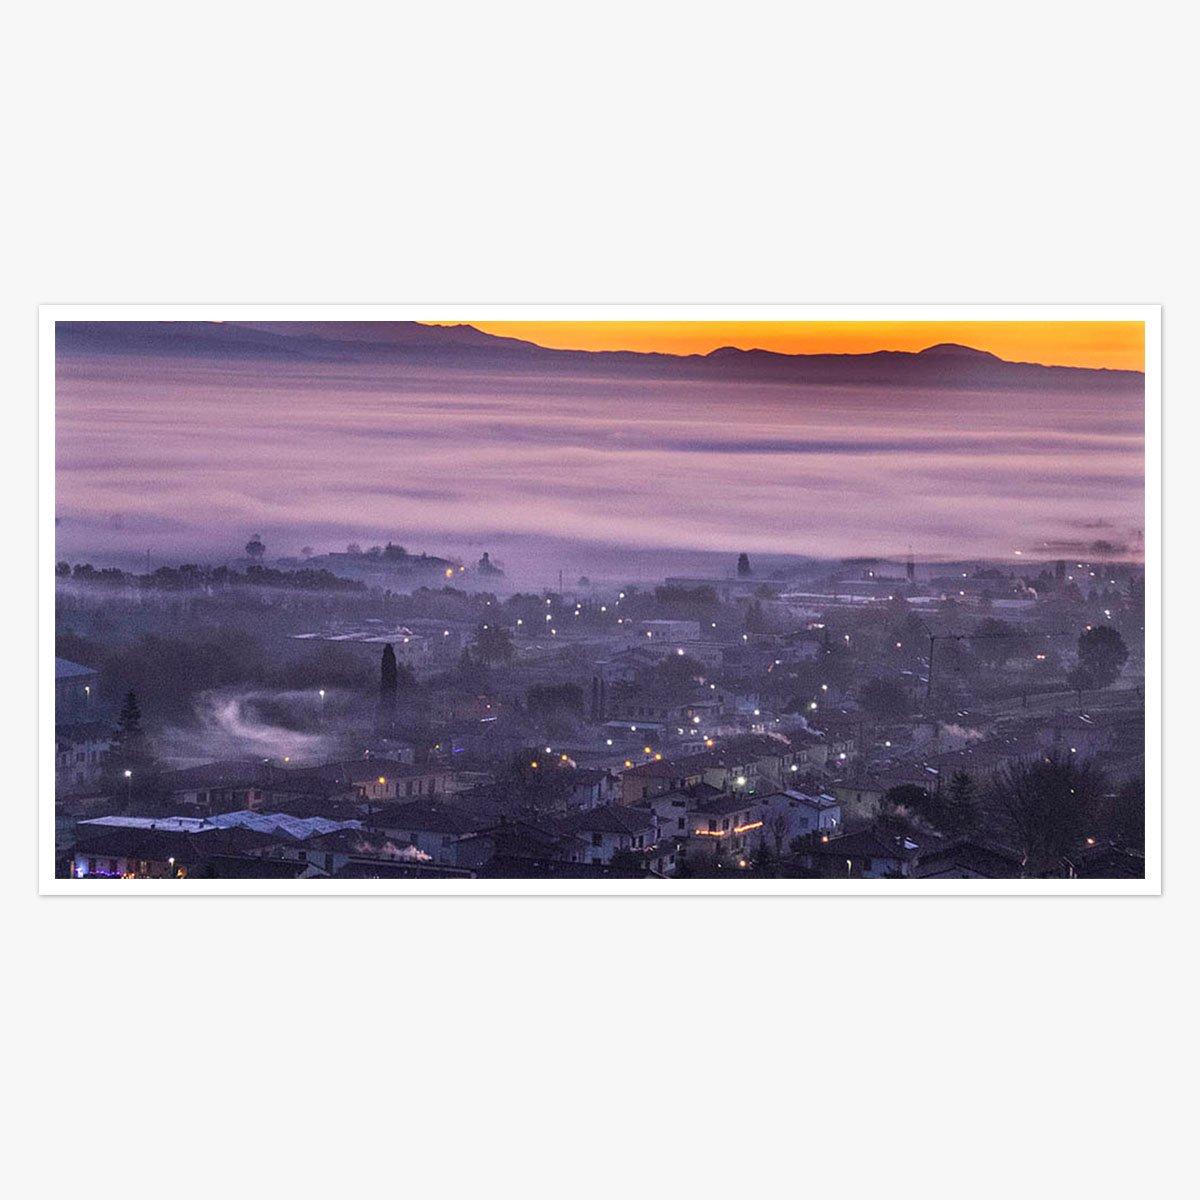 Dawn rises in Anghiari,Tuscany by Roger Taylor